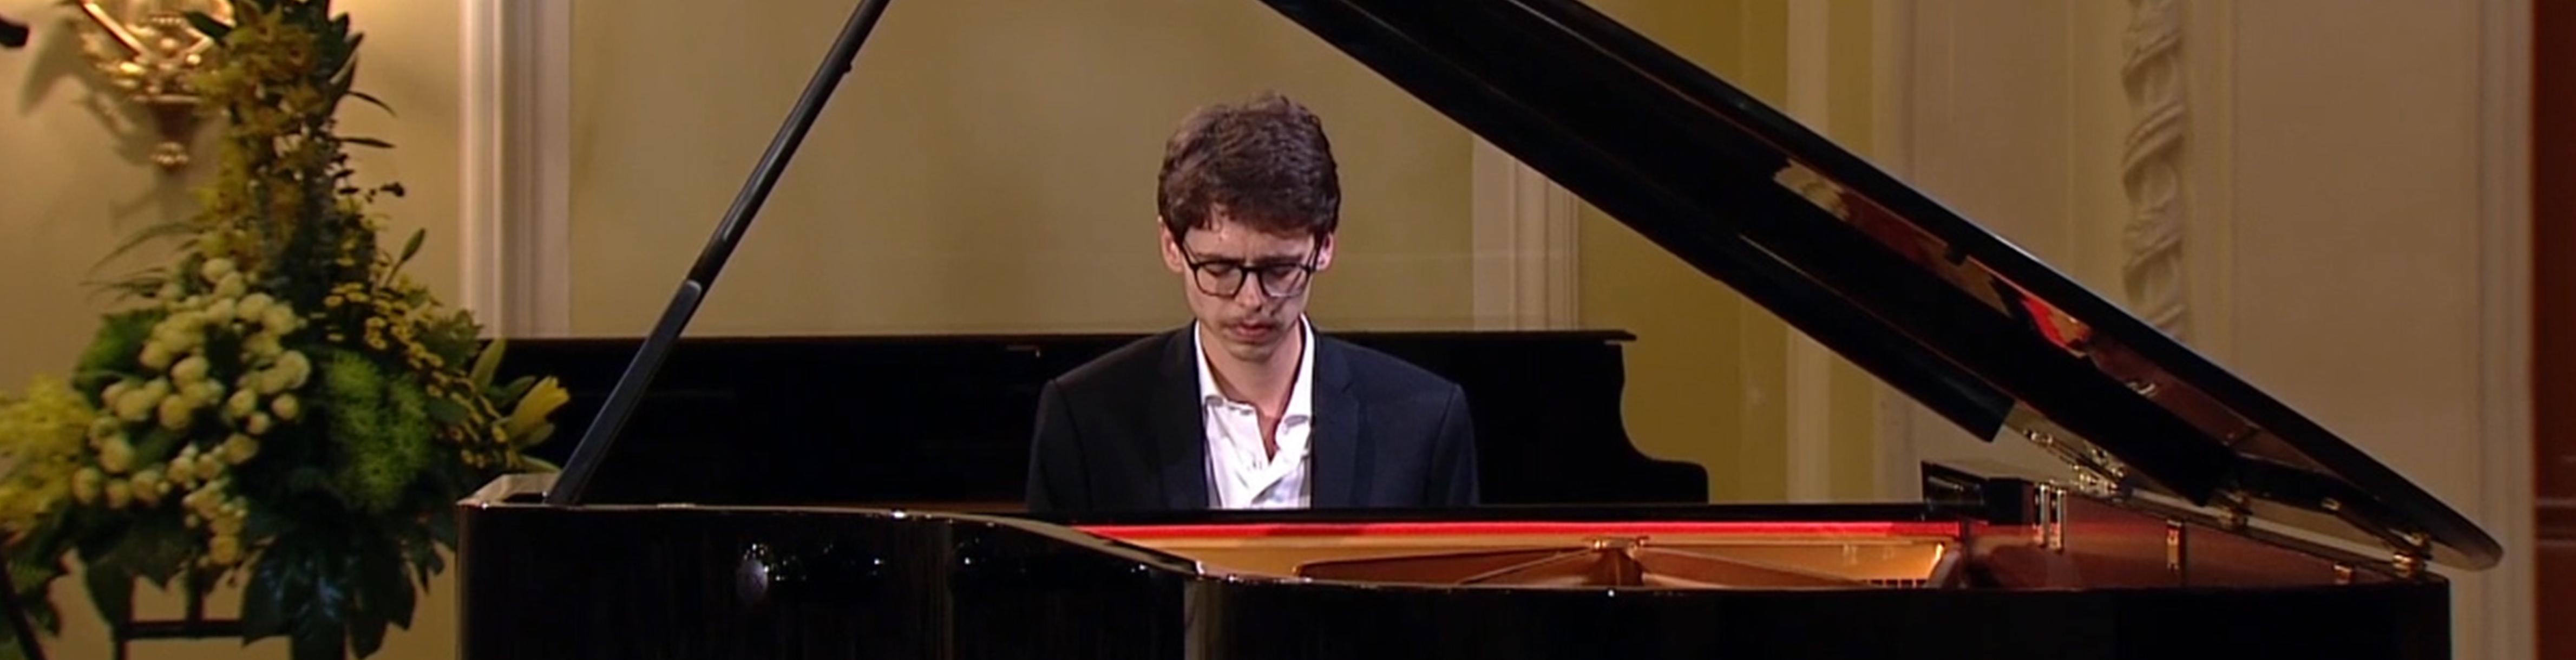 Lucas Debargue joue Chopin, Liszt, Rachmaninov et Tchaïkovski